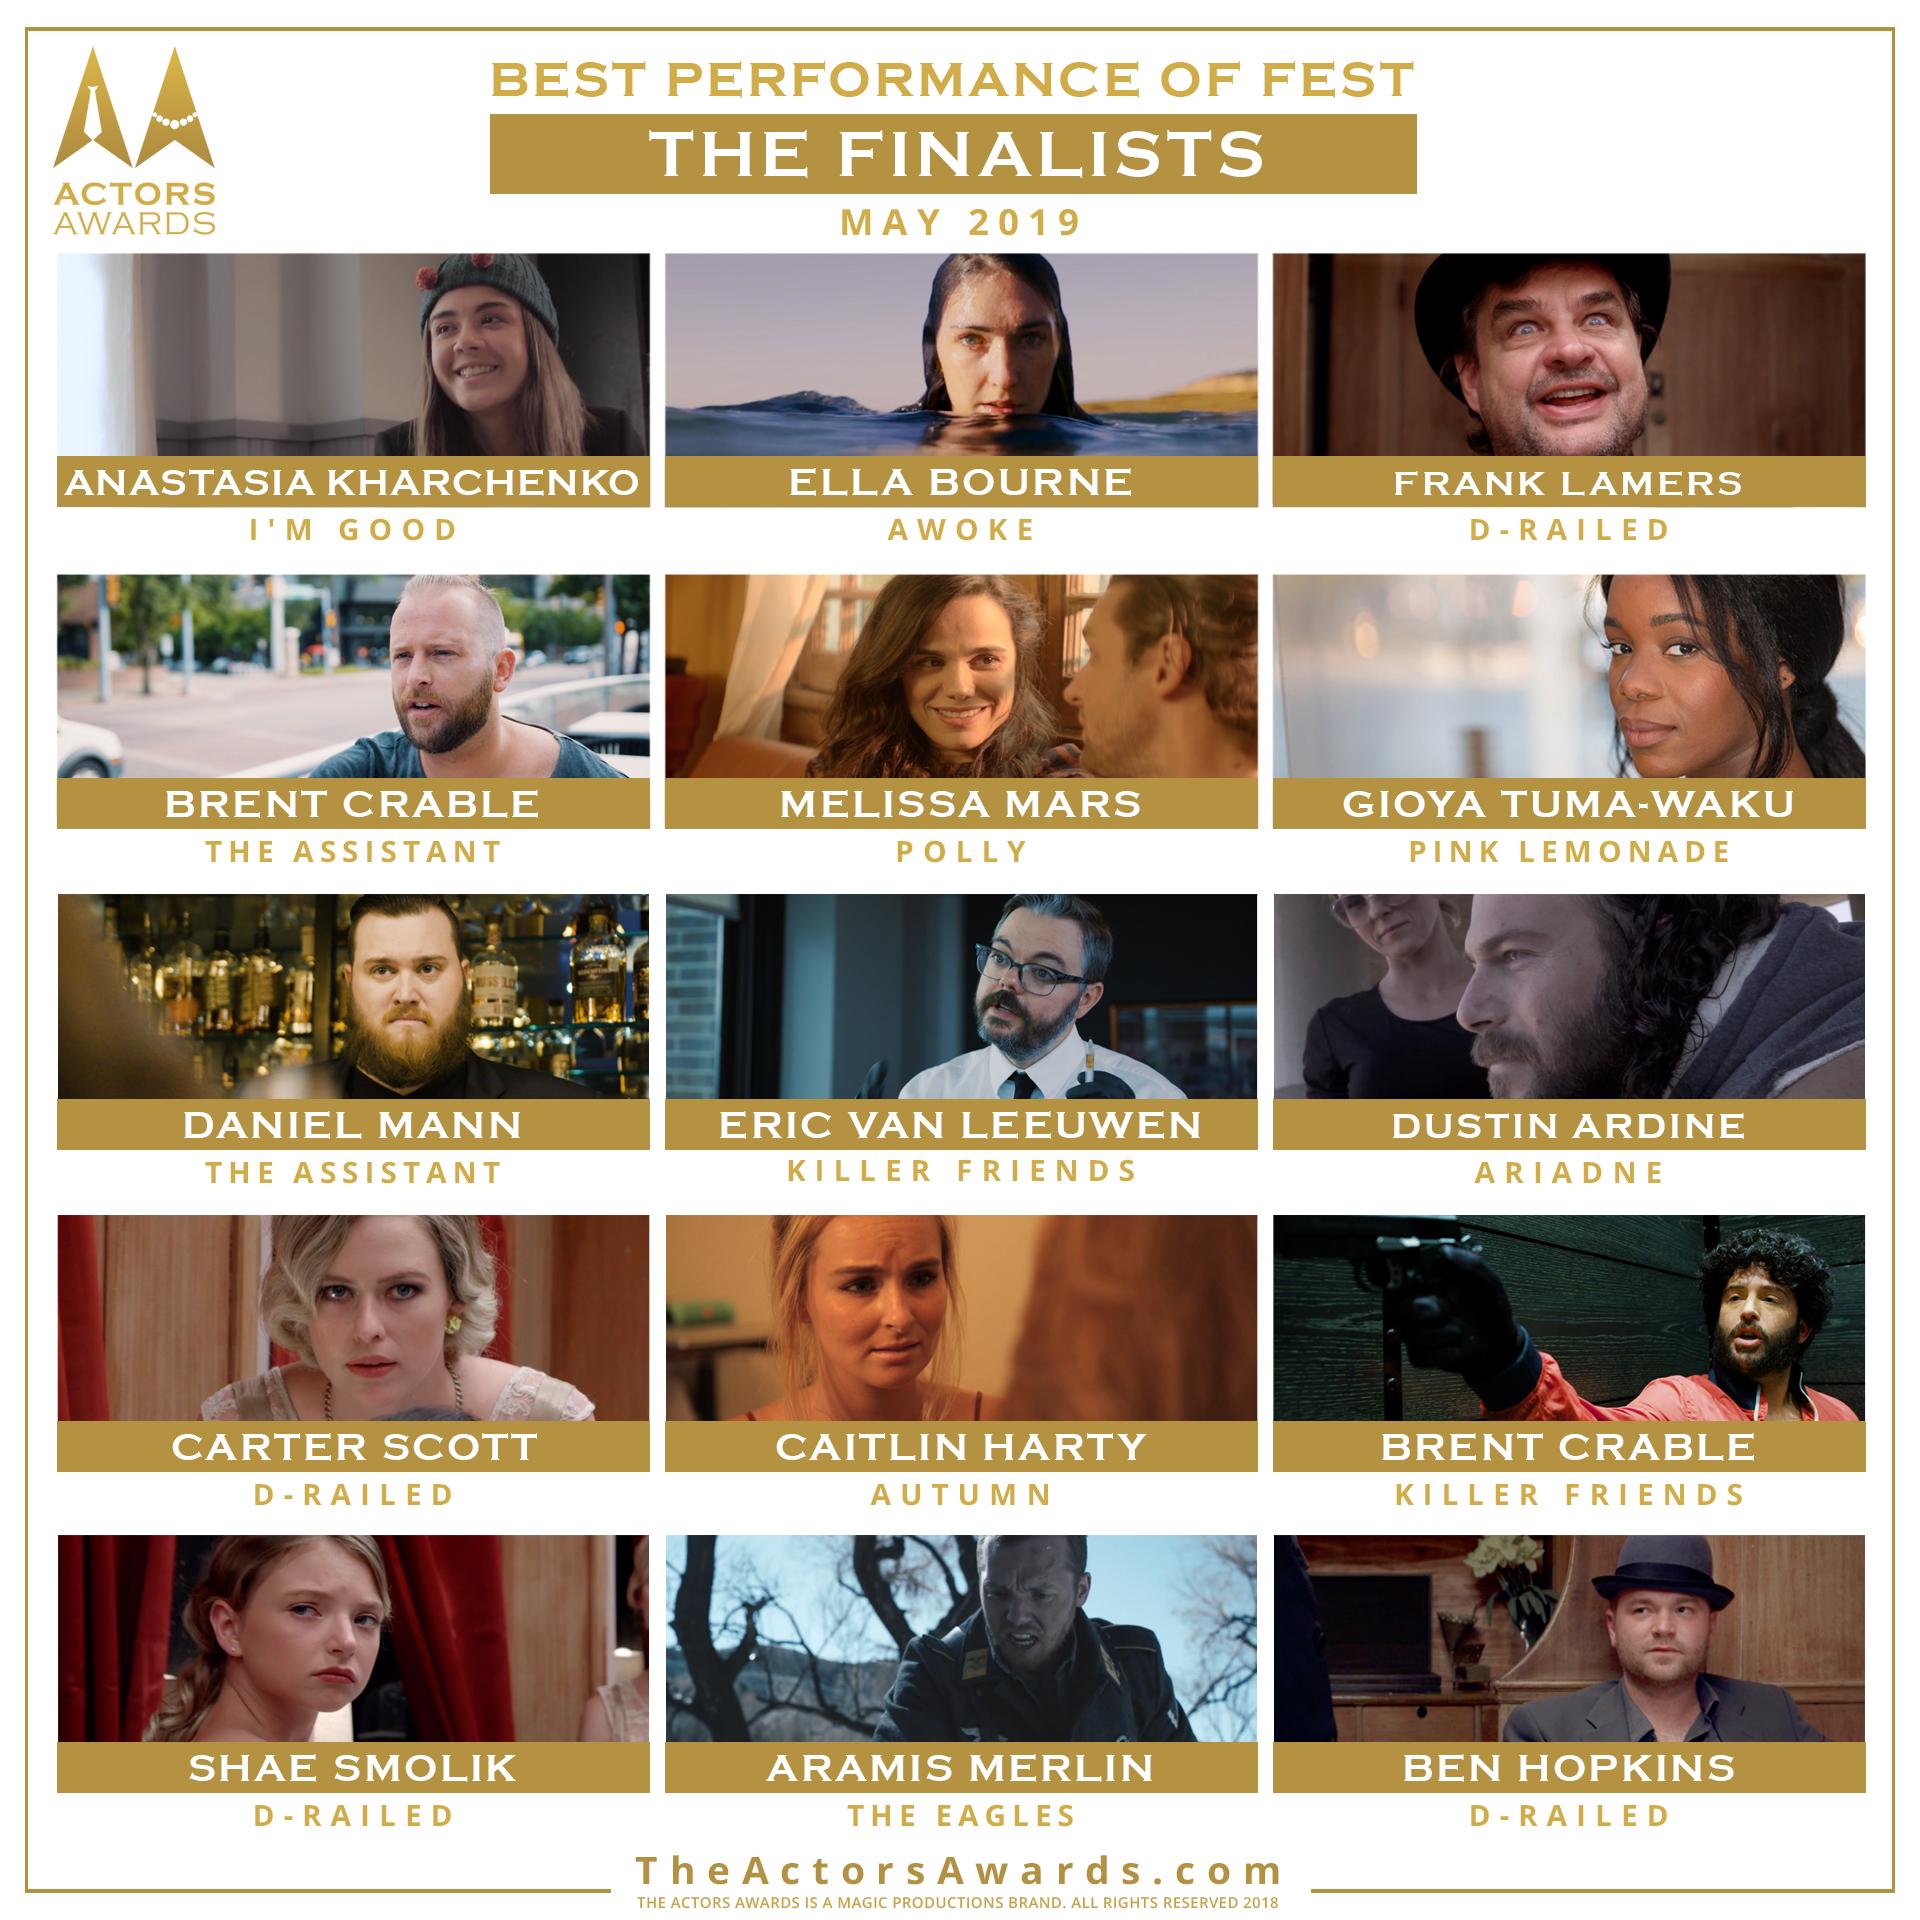 2019 05 finalists